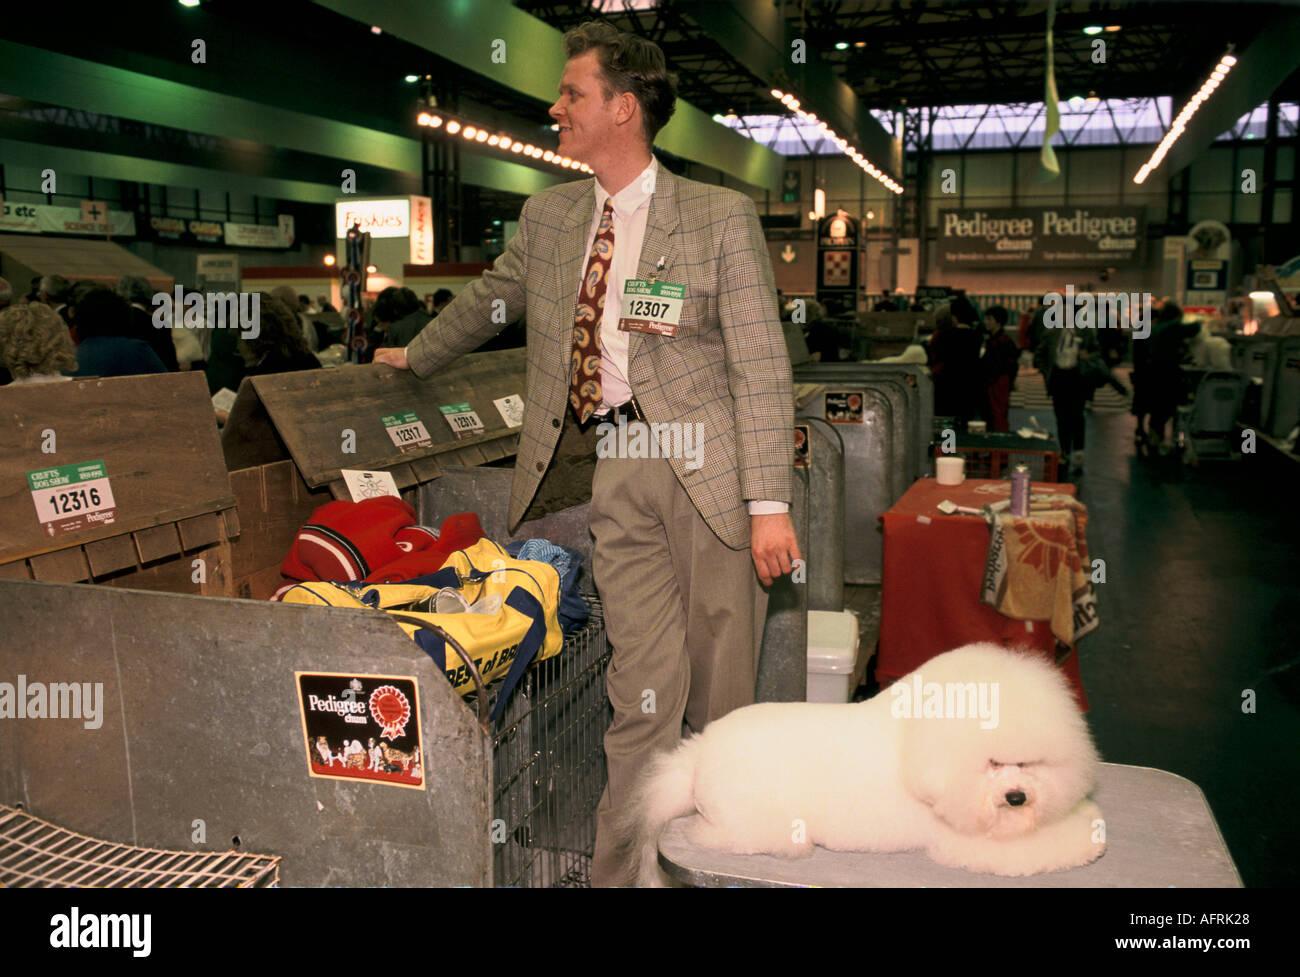 CRUFTS DOG SHOW BICHON FRISES PET DOGS 1980s UK HOMER SYKES - Stock Image